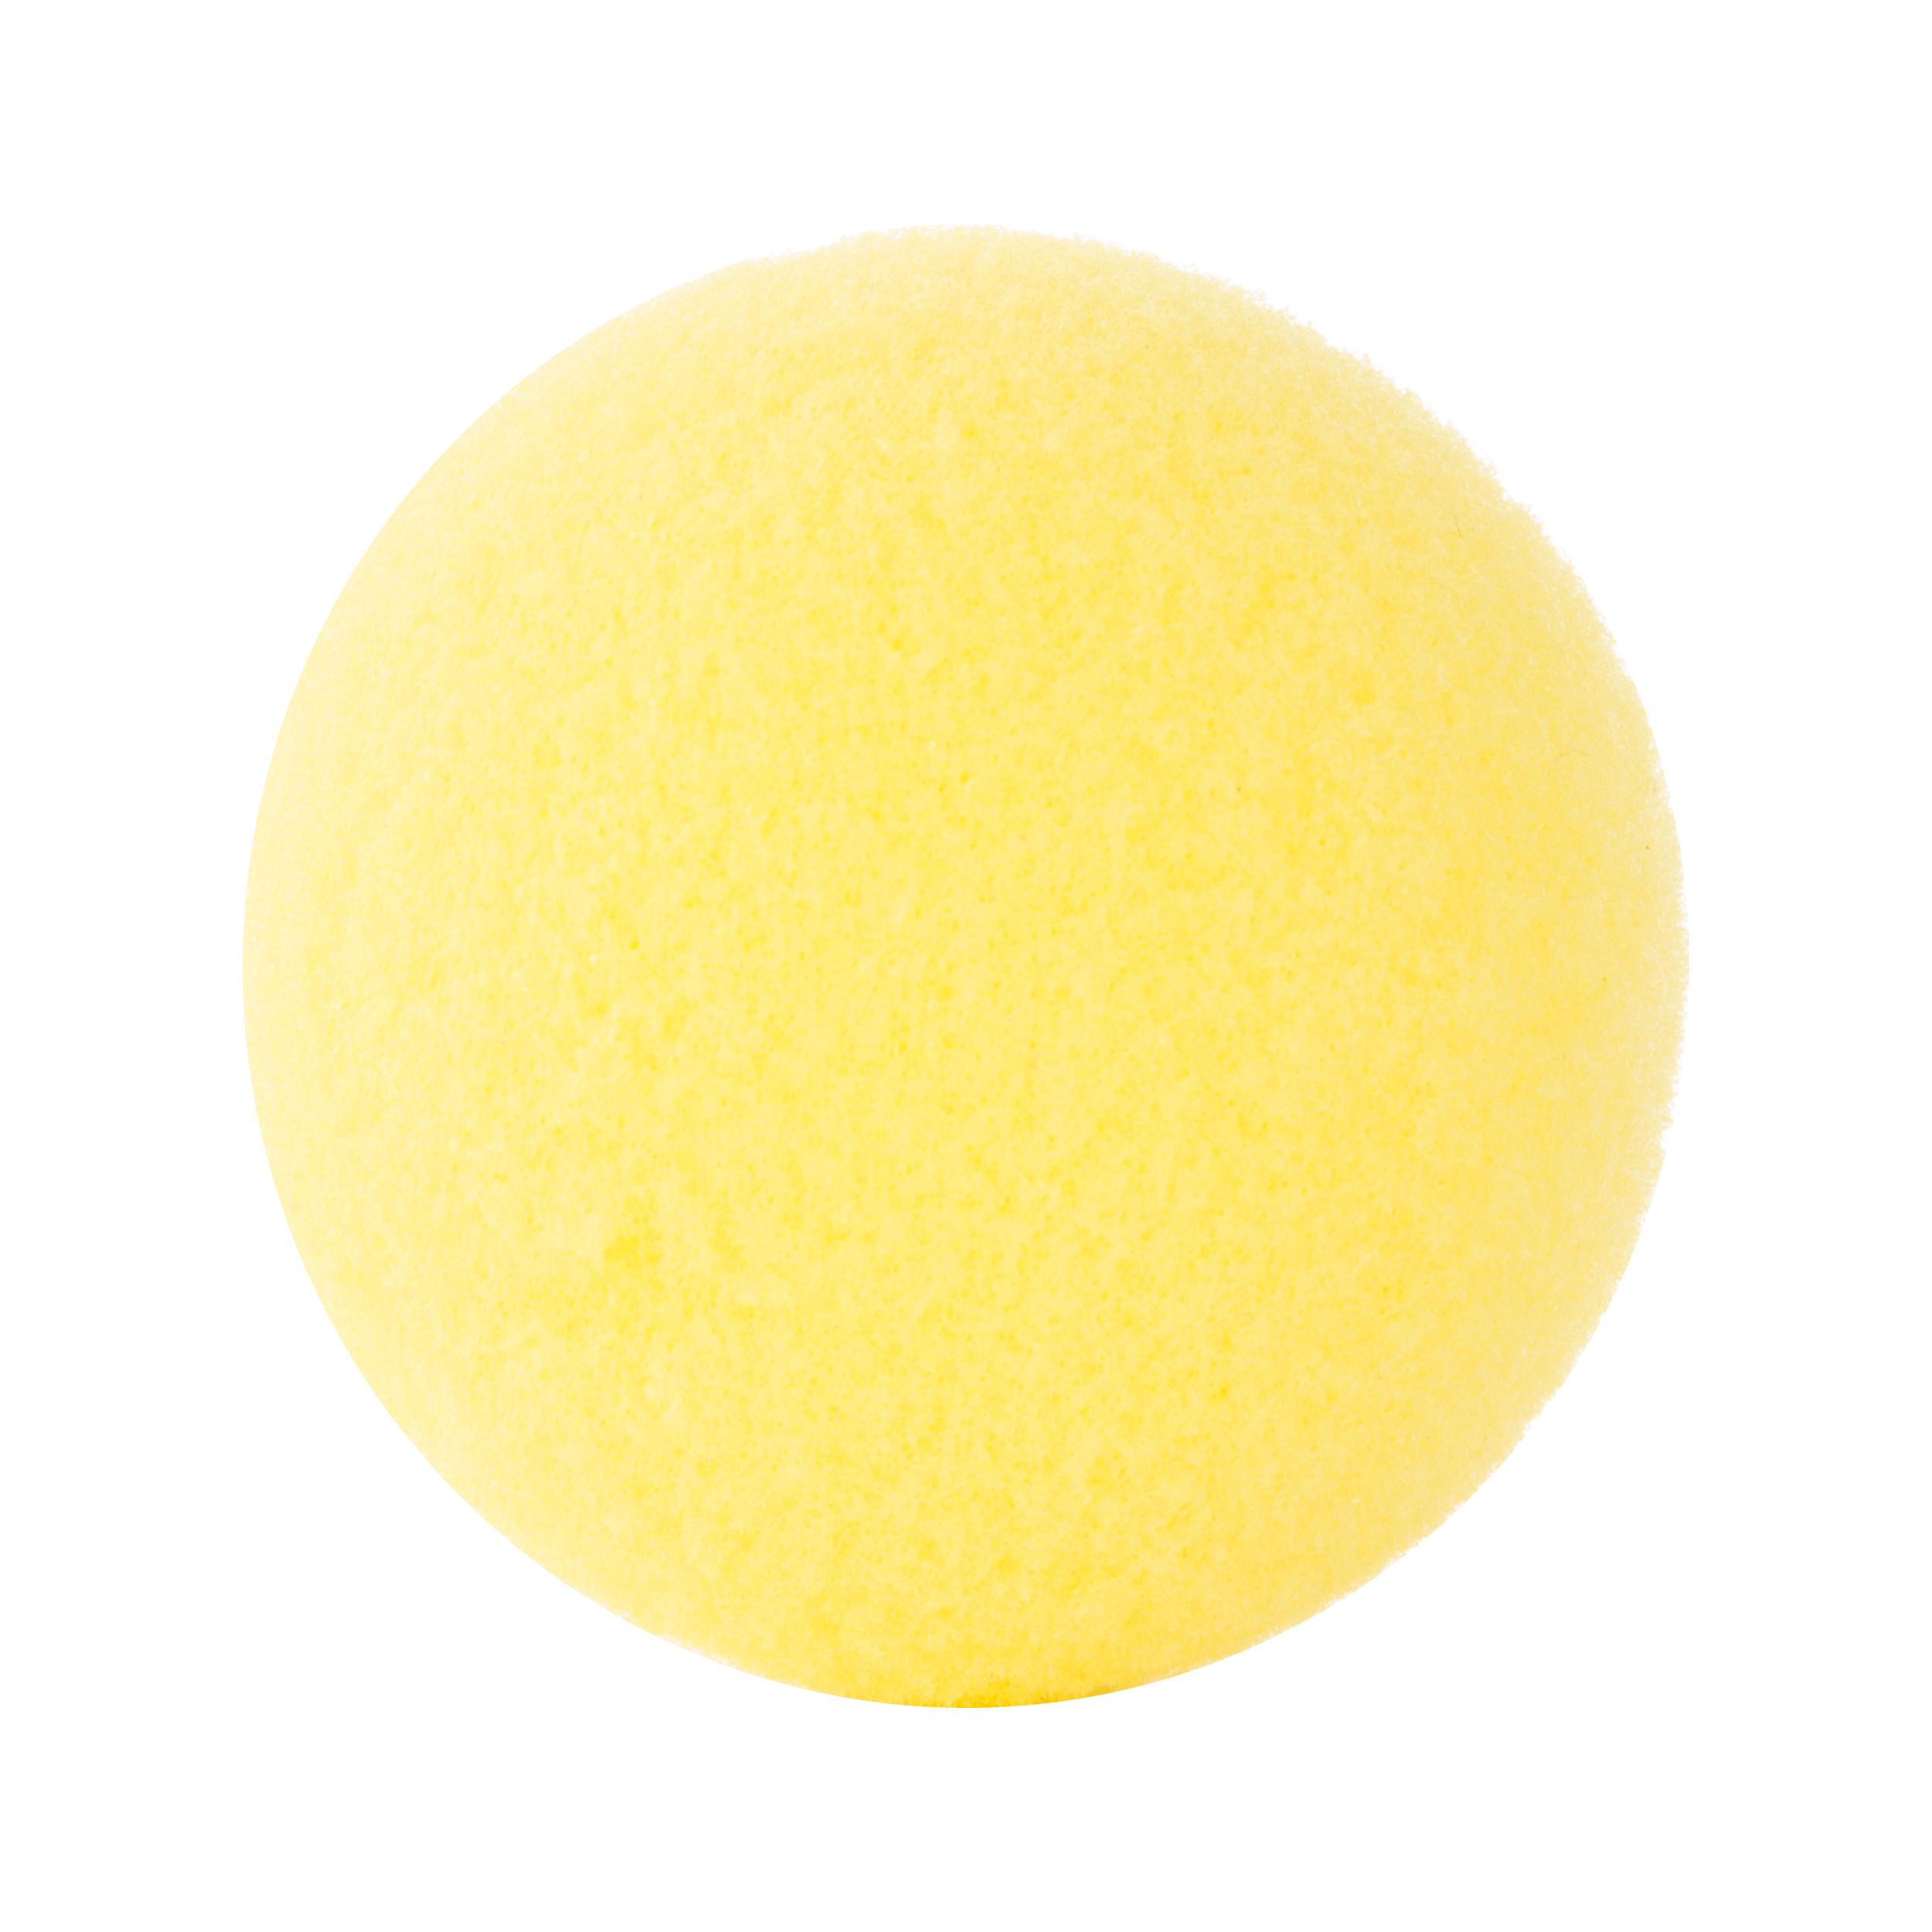 Kid's Badminton Racket discover Set - Pink / Blue